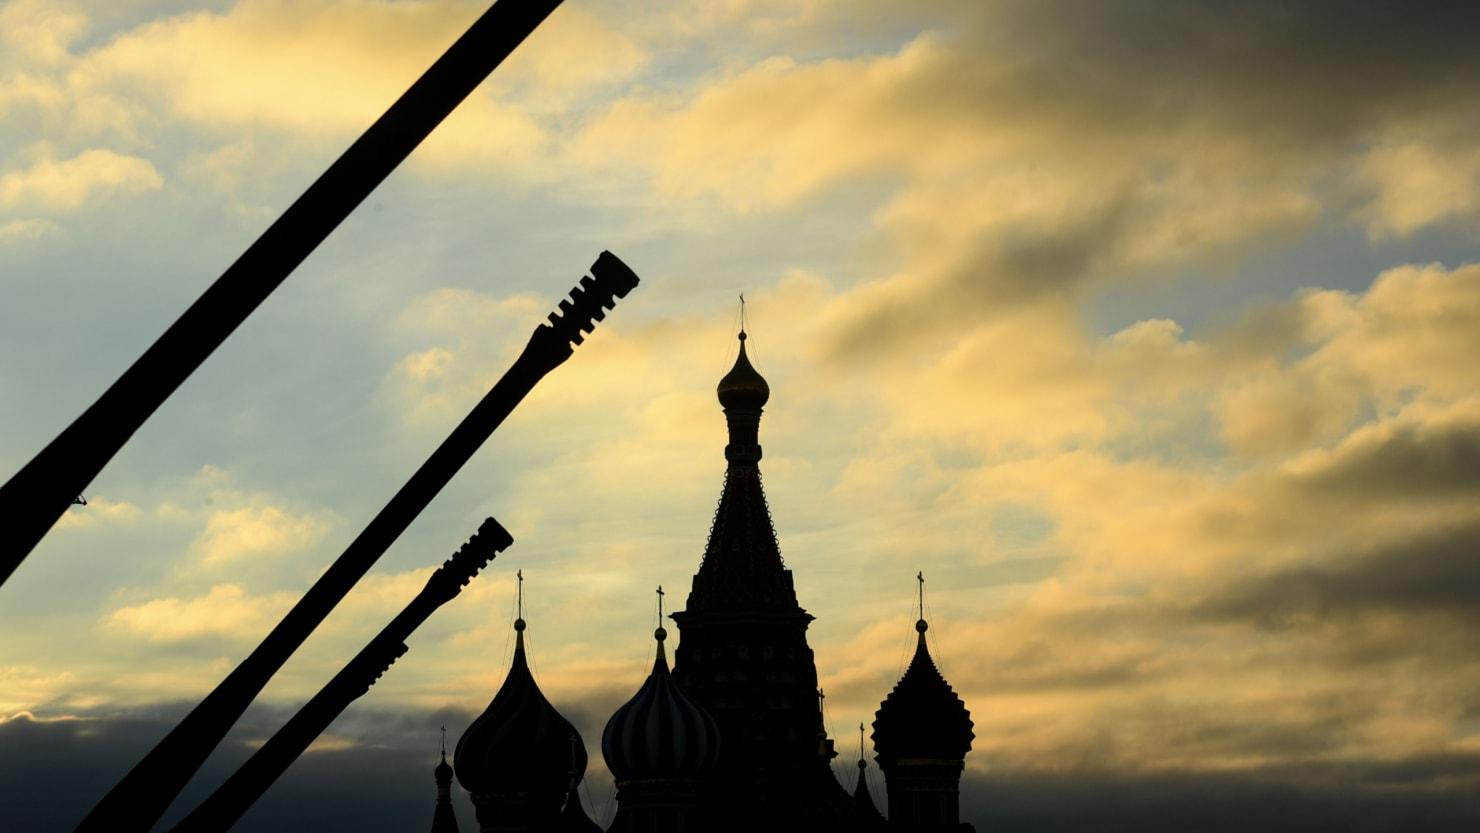 russian gru spy chief igor korobov dies after long and serious